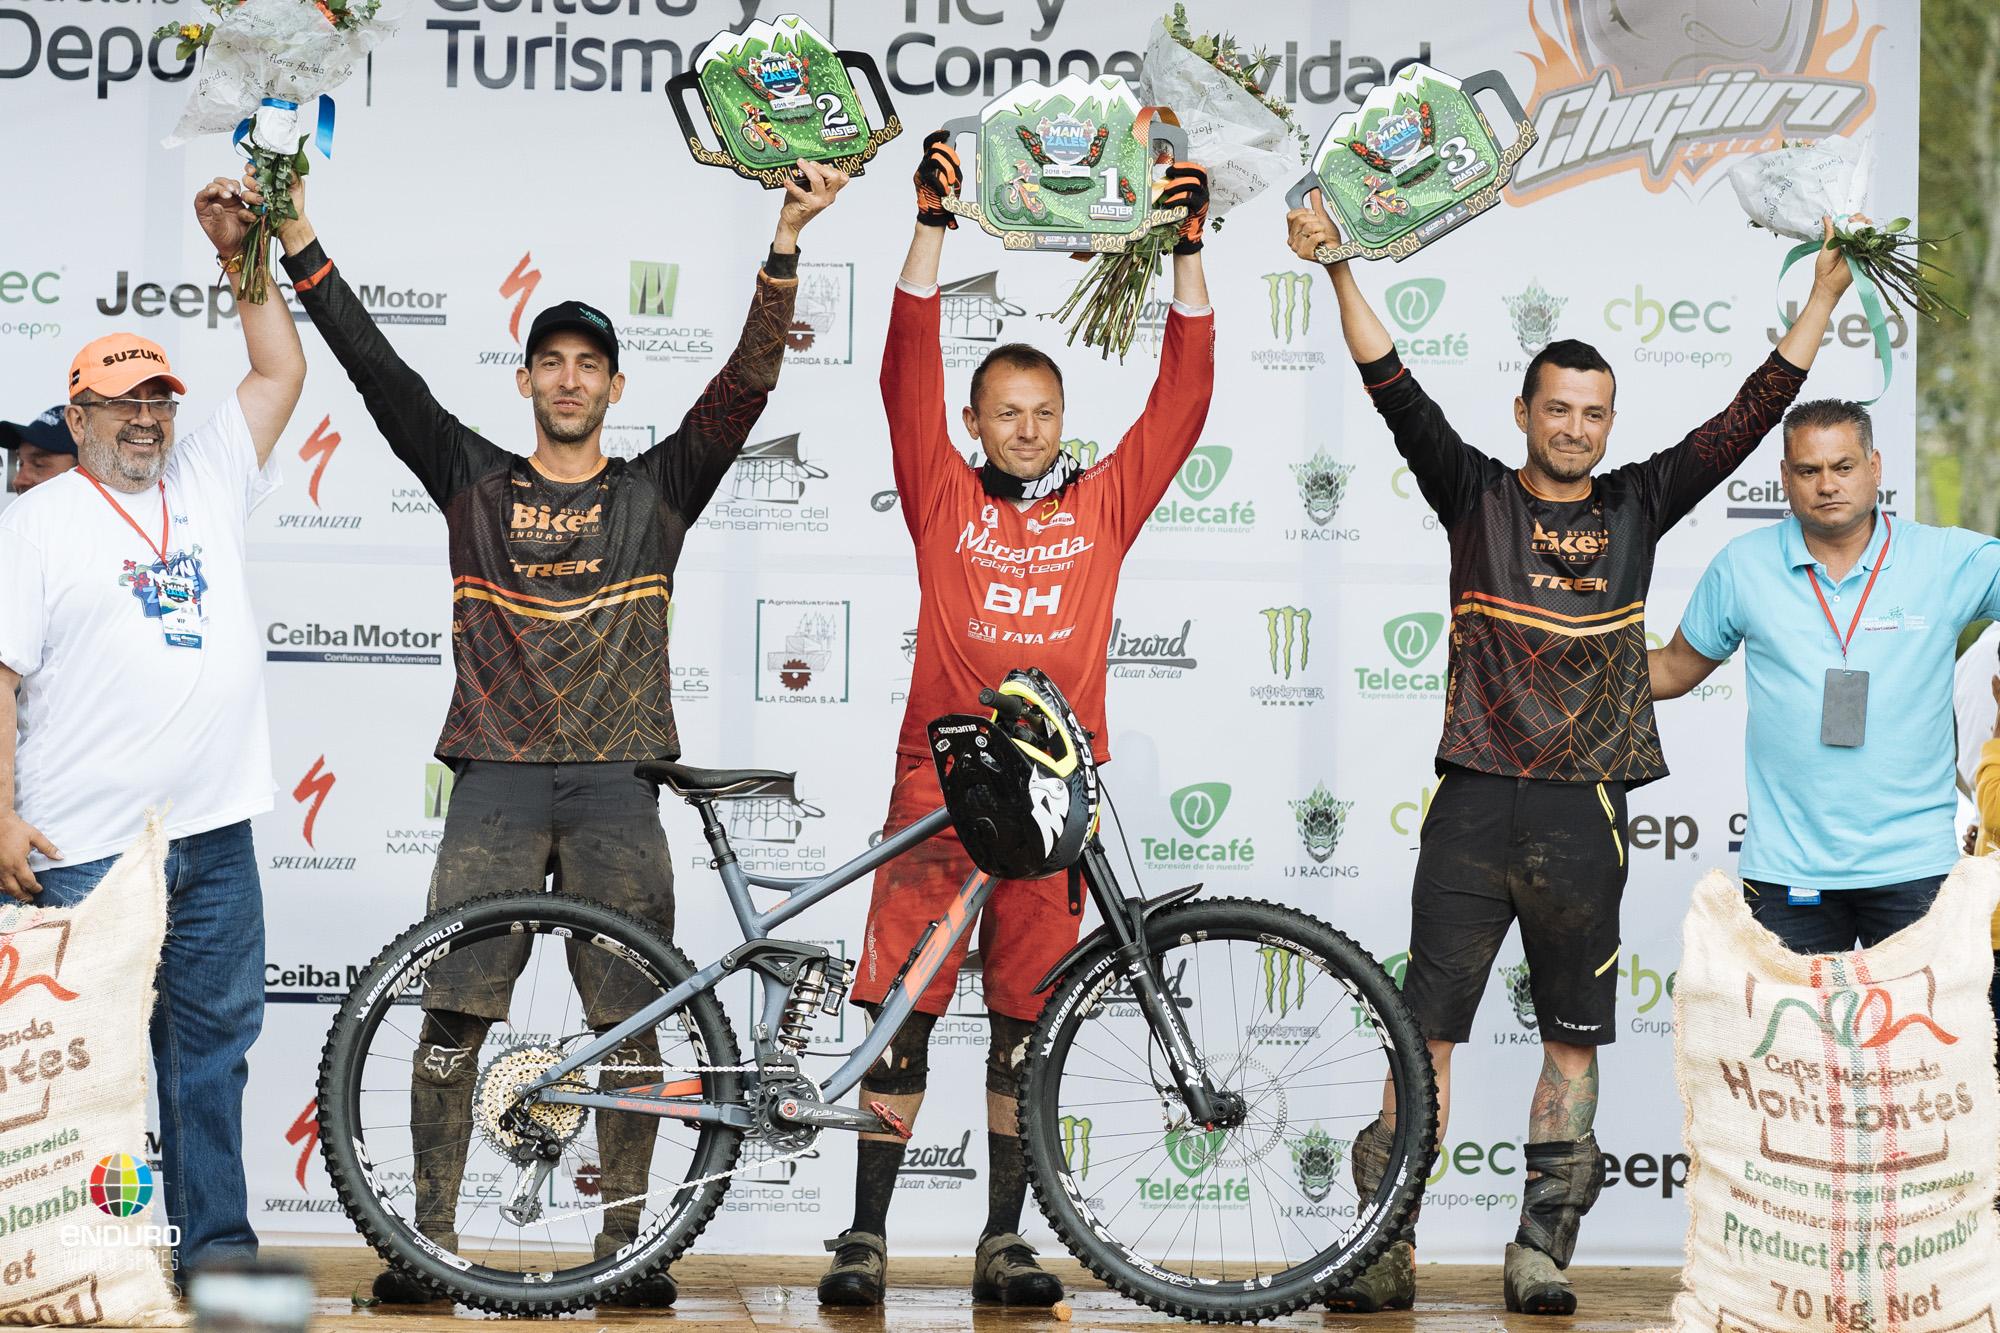 Master Men podium: 1st Karim Amour, 2nd Patricio Escobar, 3rd Dewin Leandro Carvajal.